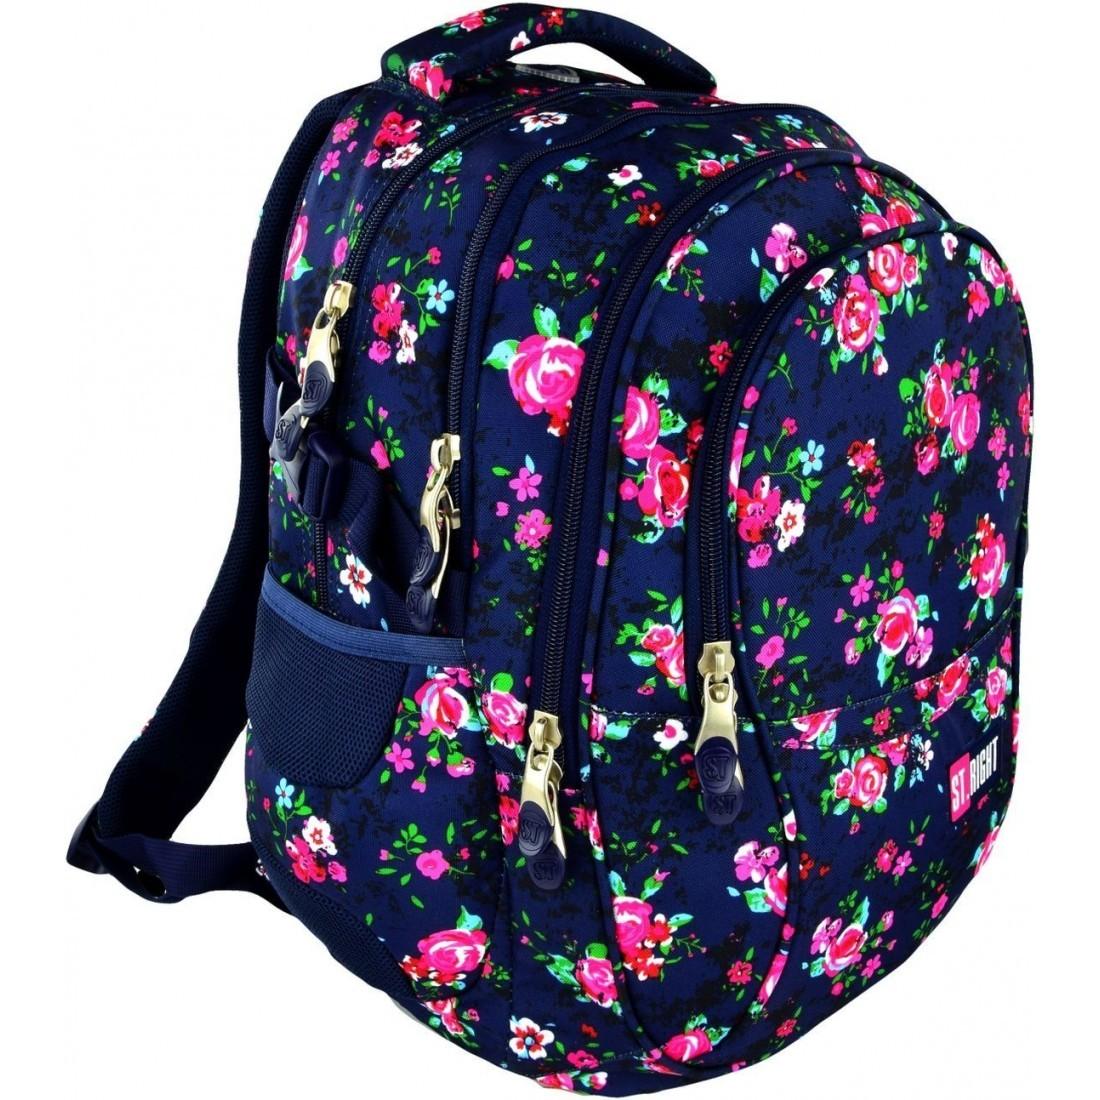 f220dc18eaa0e Plecak szkolny na laptop 01 ST.RIGHT NIGHT ROSE GARDEN dla ...